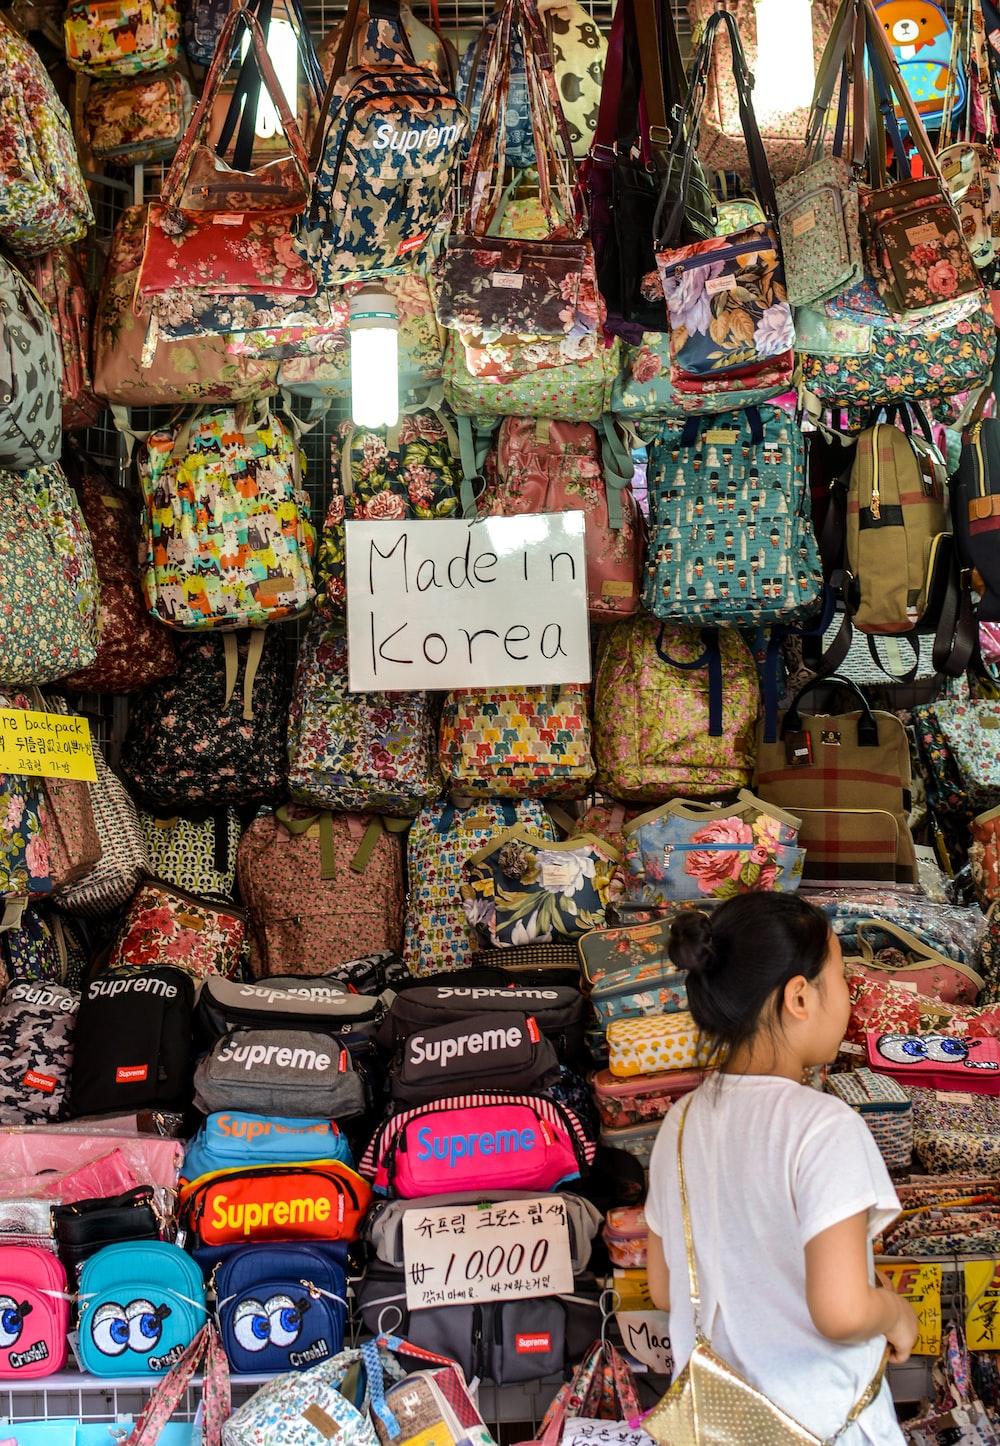 Market, bazaar, shop and person | HD photo by Stefan